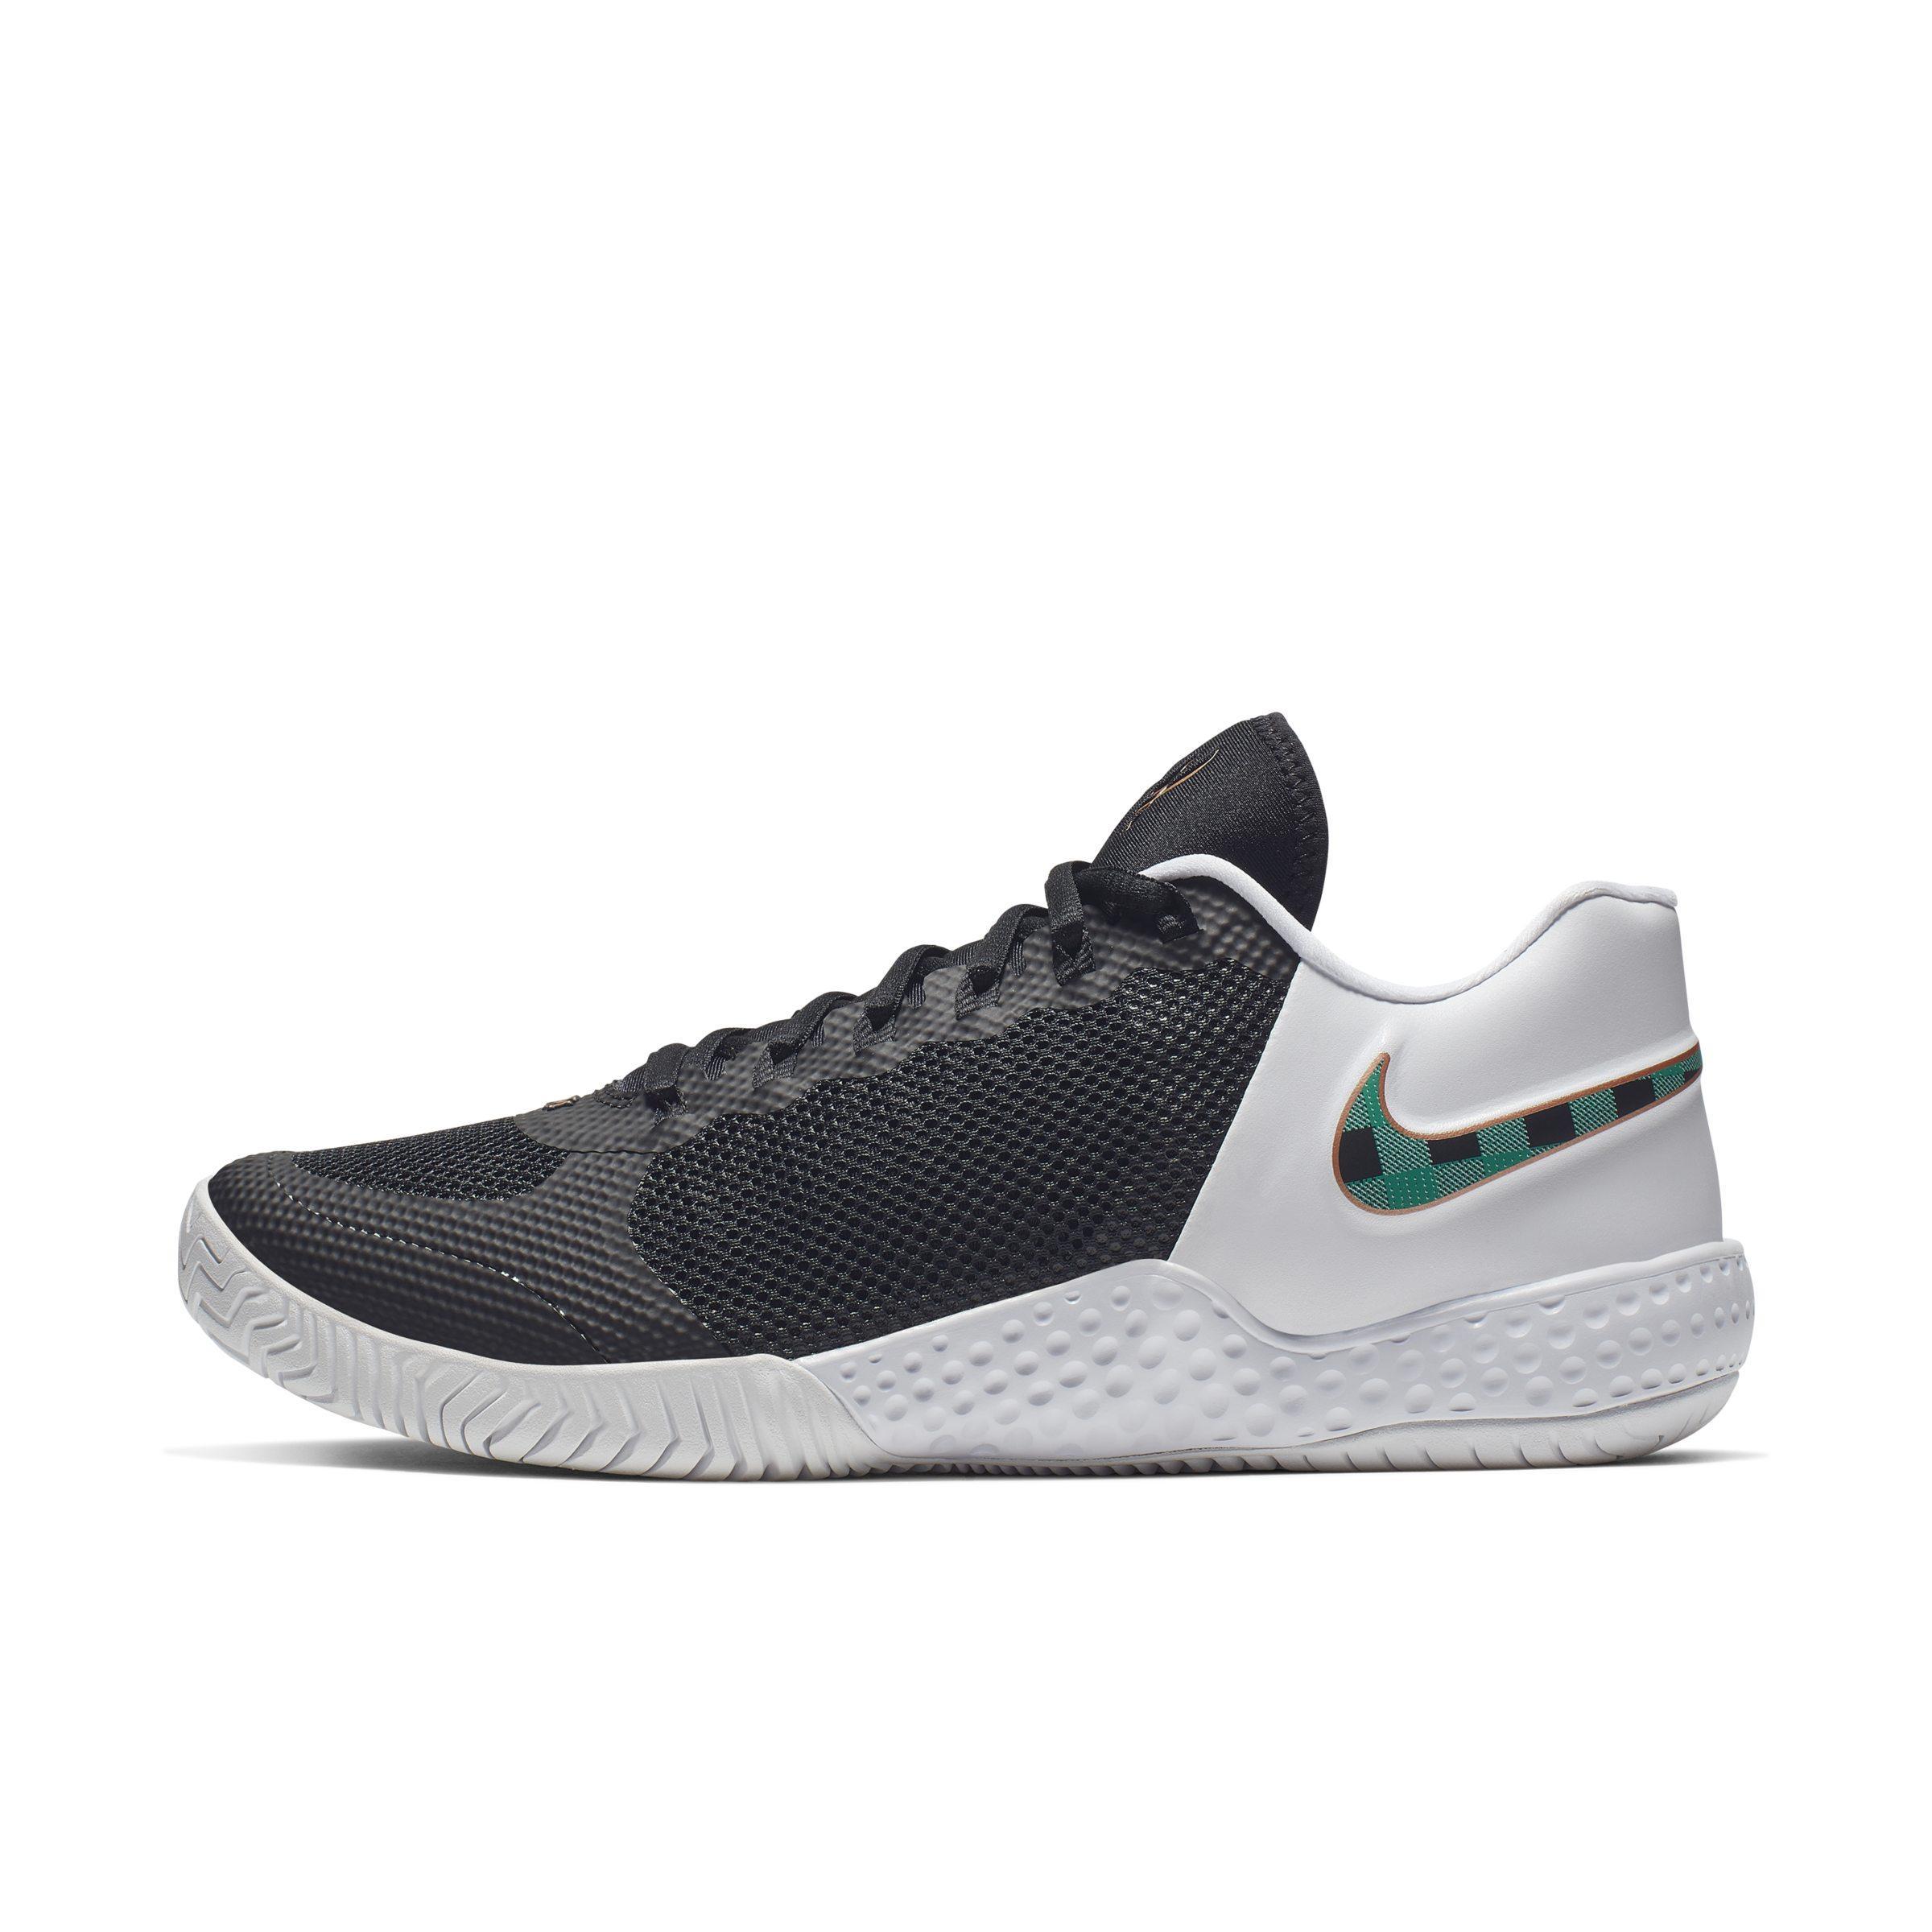 separation shoes 2bb5b c23bb Nike. Women s Black Court Flare 2 Qs Hard Court Tennis Shoe